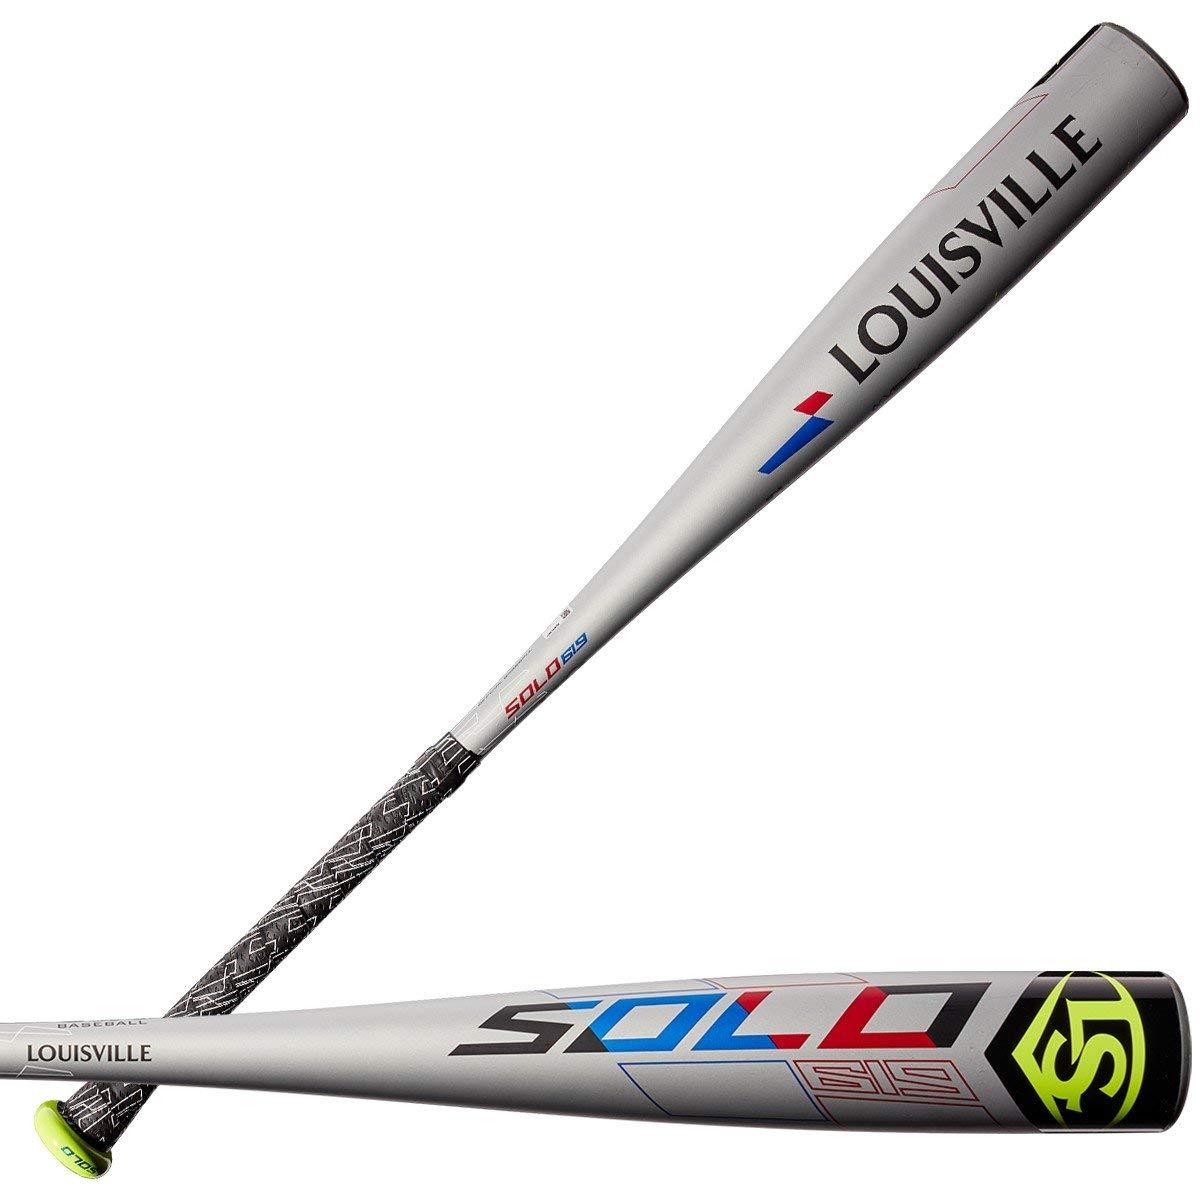 louisville-slugger-2019-solo-619-11-usa-baseball-bat-30-inch-19-oz WTLUBS619B1130  887768730031 Meets USA bat standard; approved for play in little League Baseball